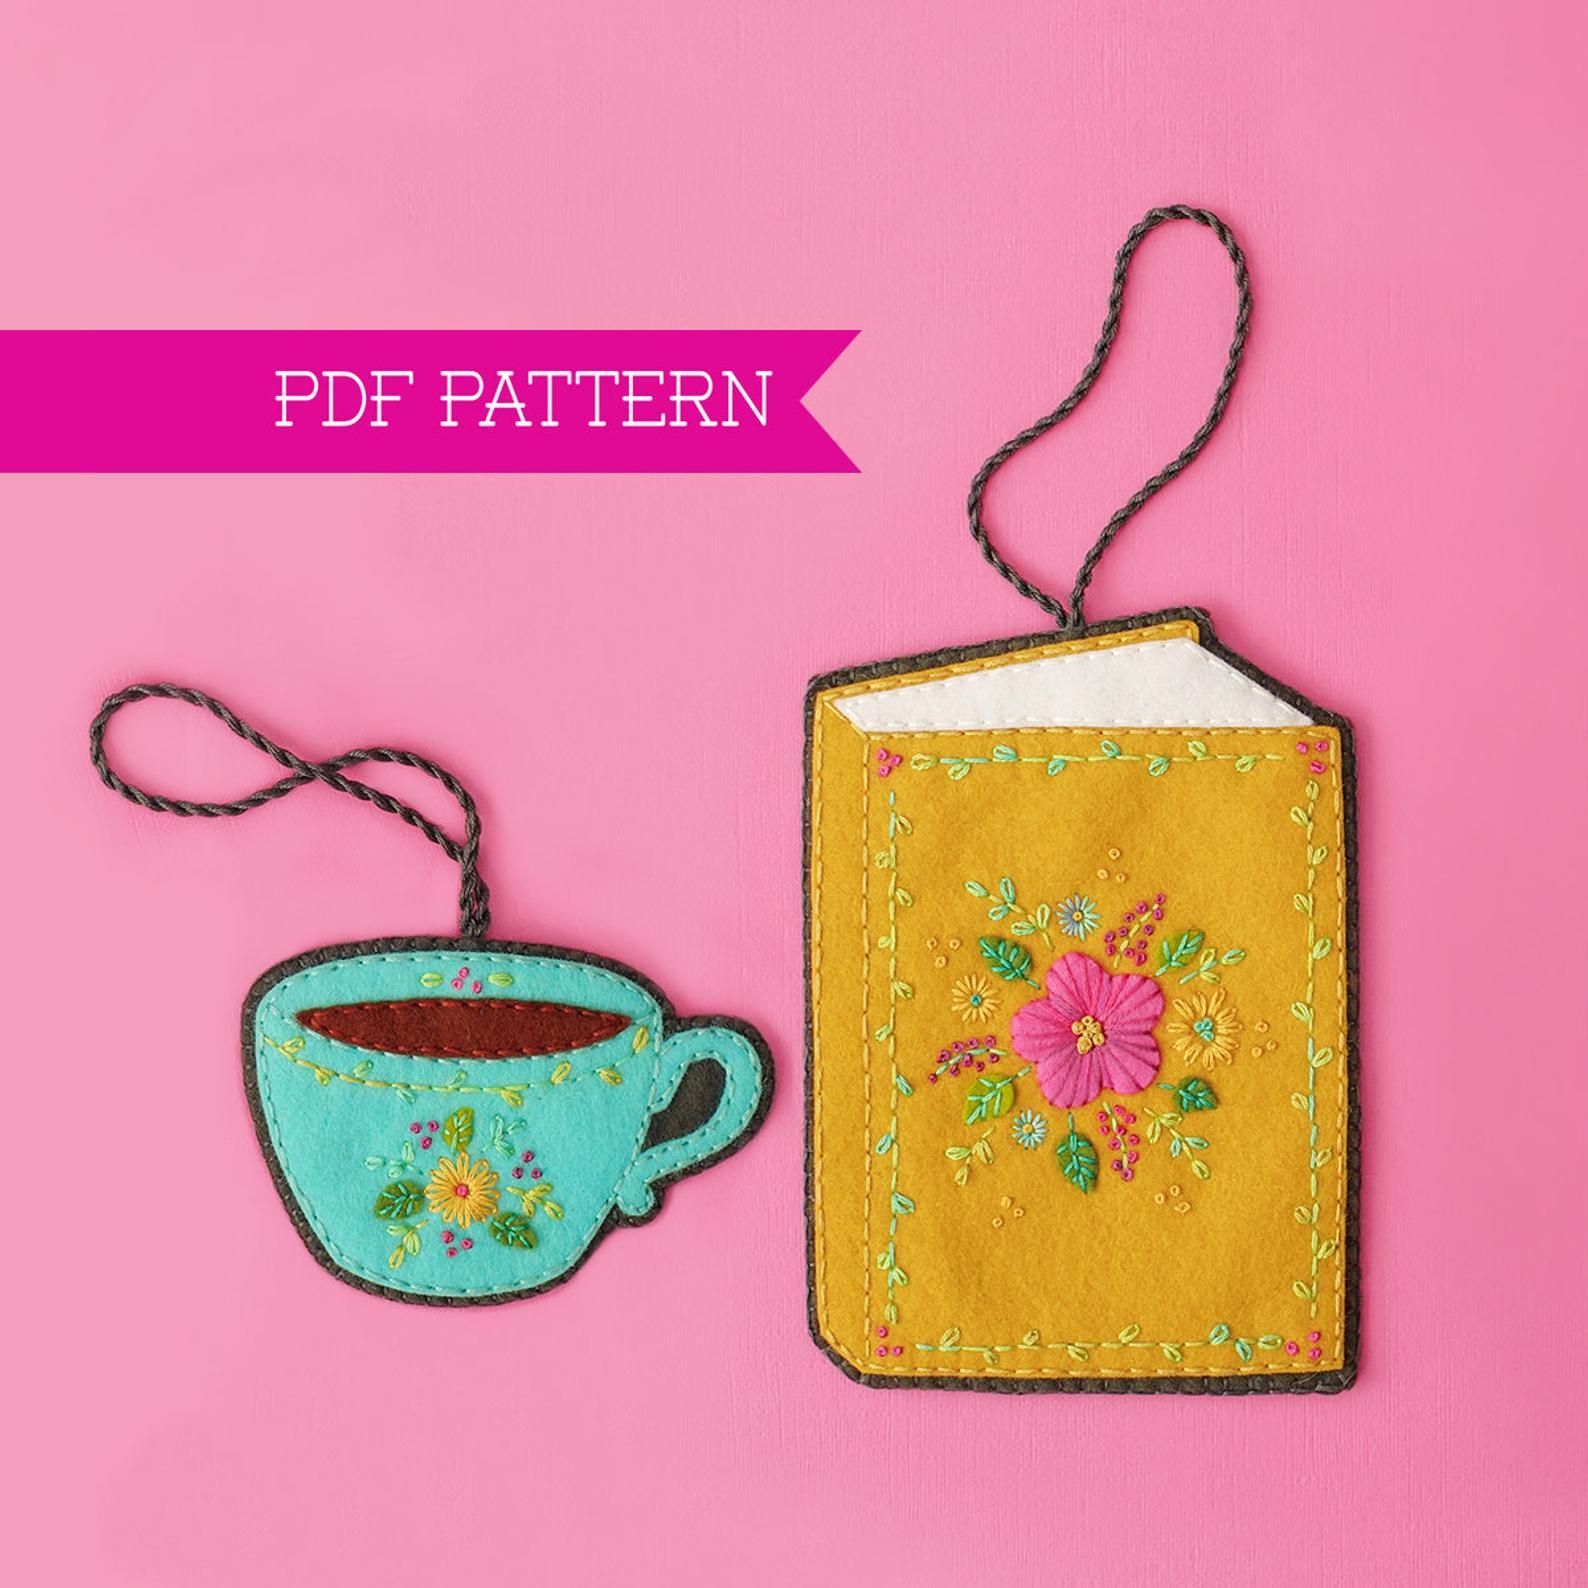 felt book ornament sewing pattern